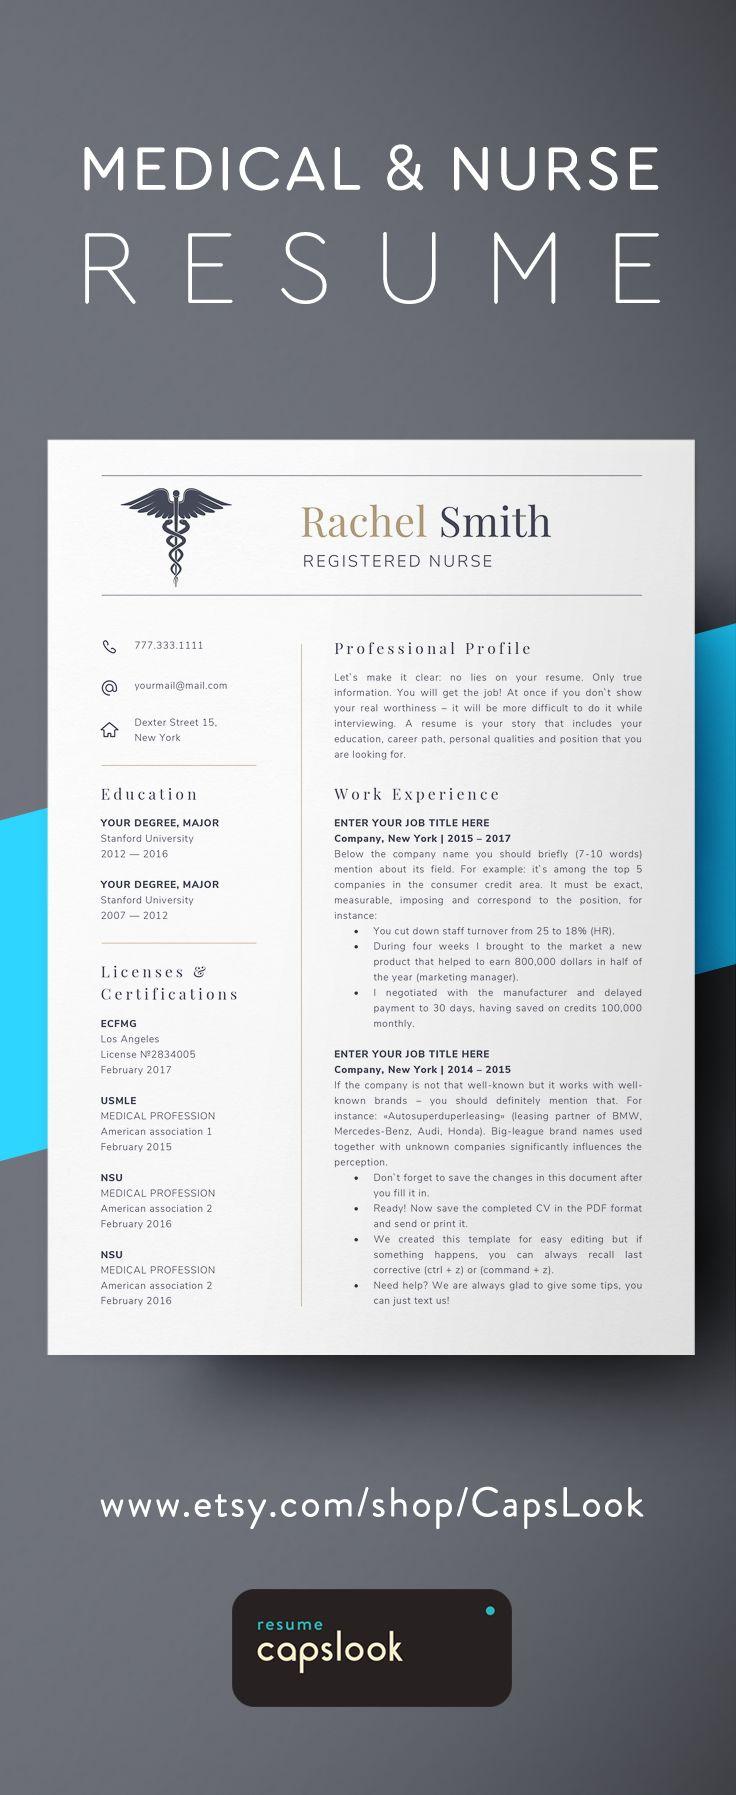 This page features 8 nursing resume samples. Nurse RN